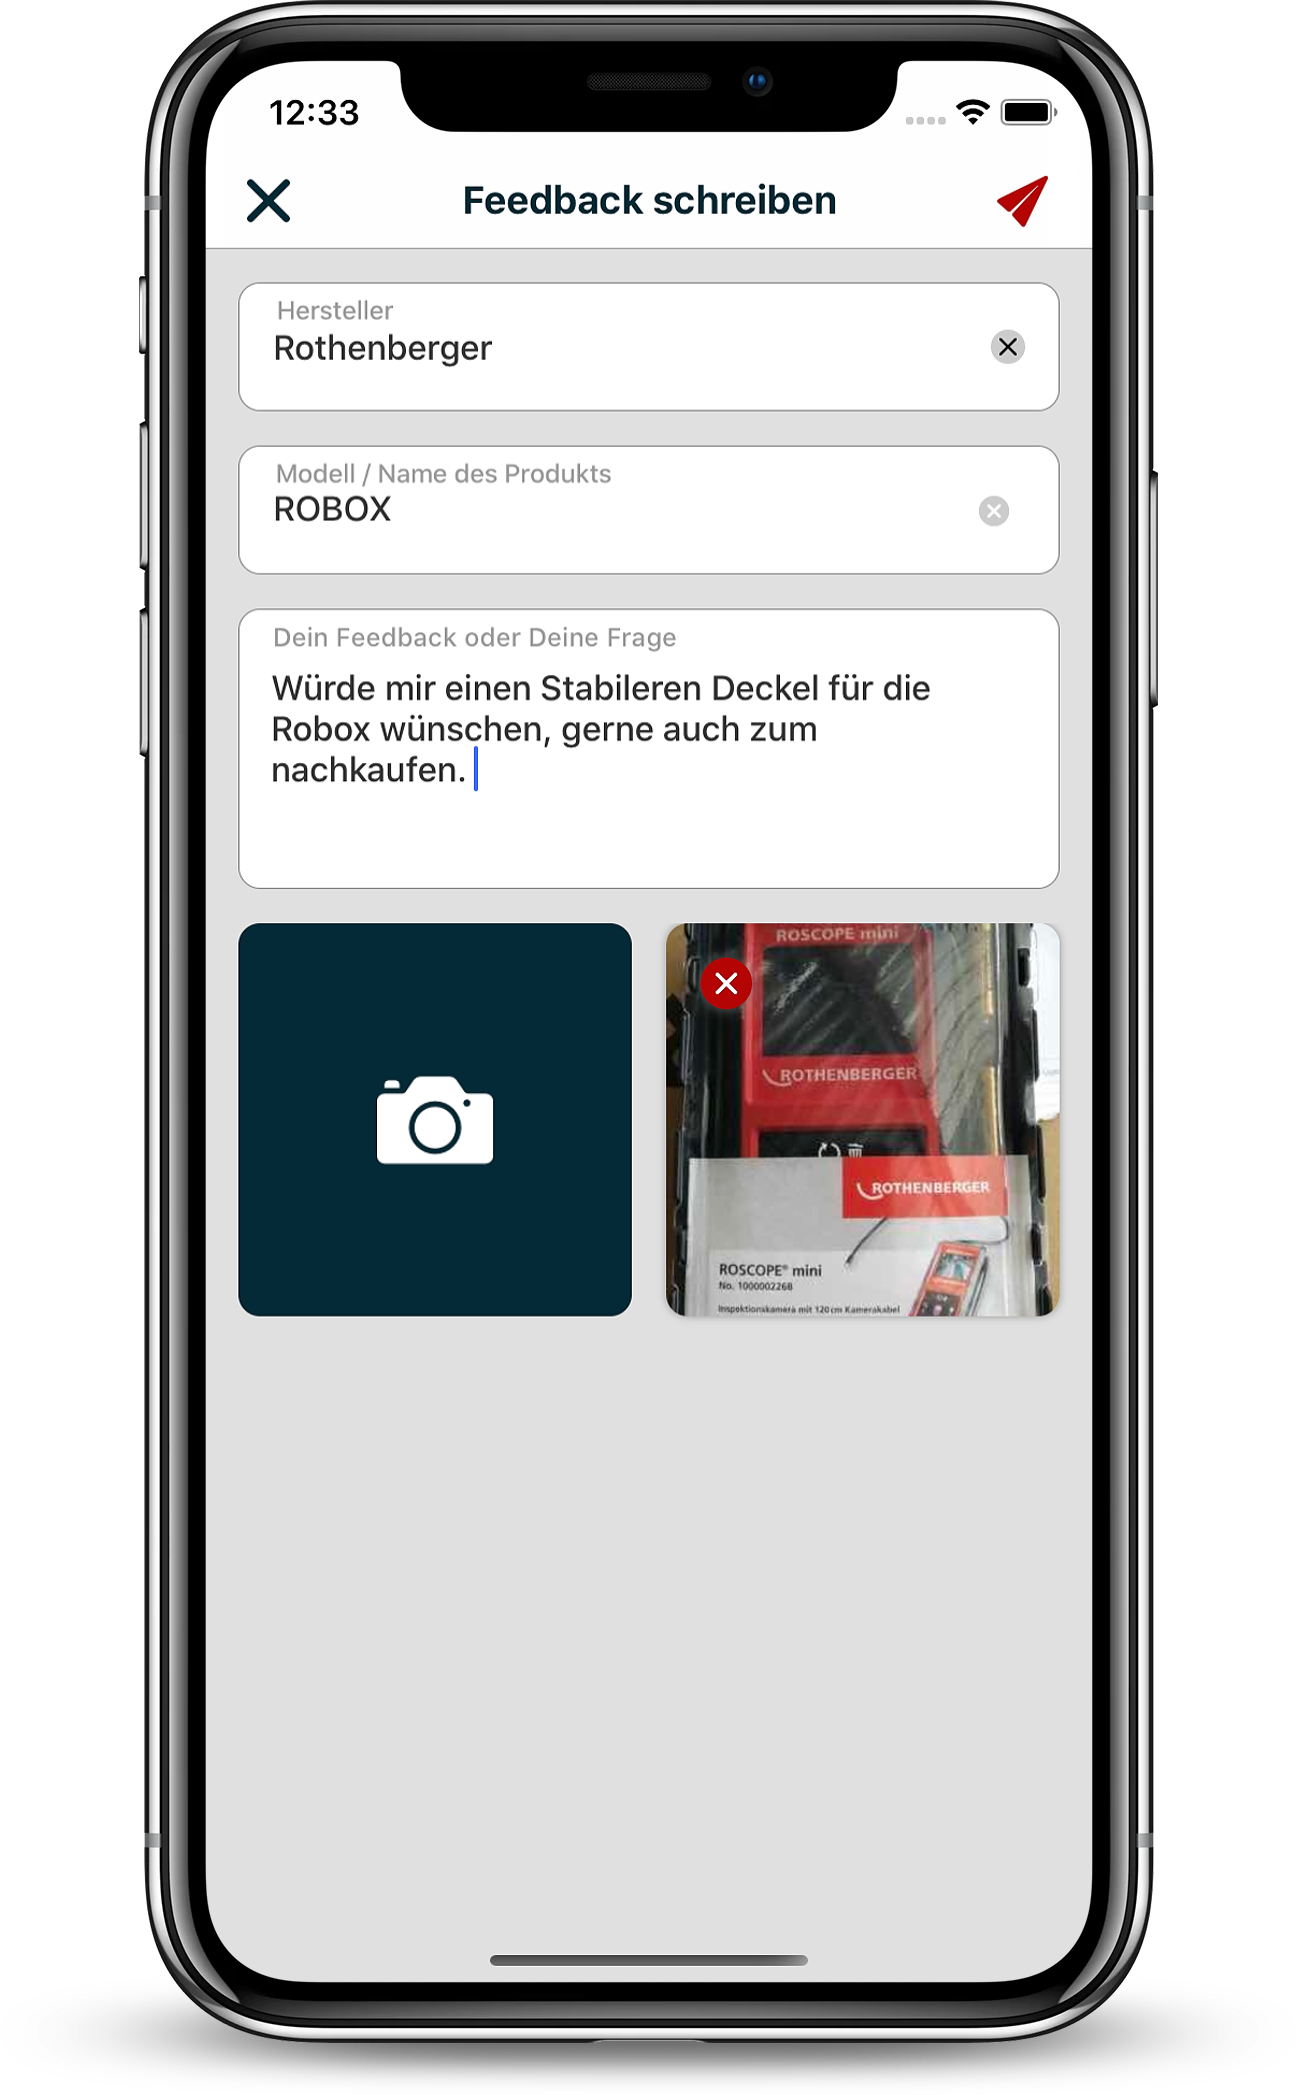 Evolute App Feedback Geben